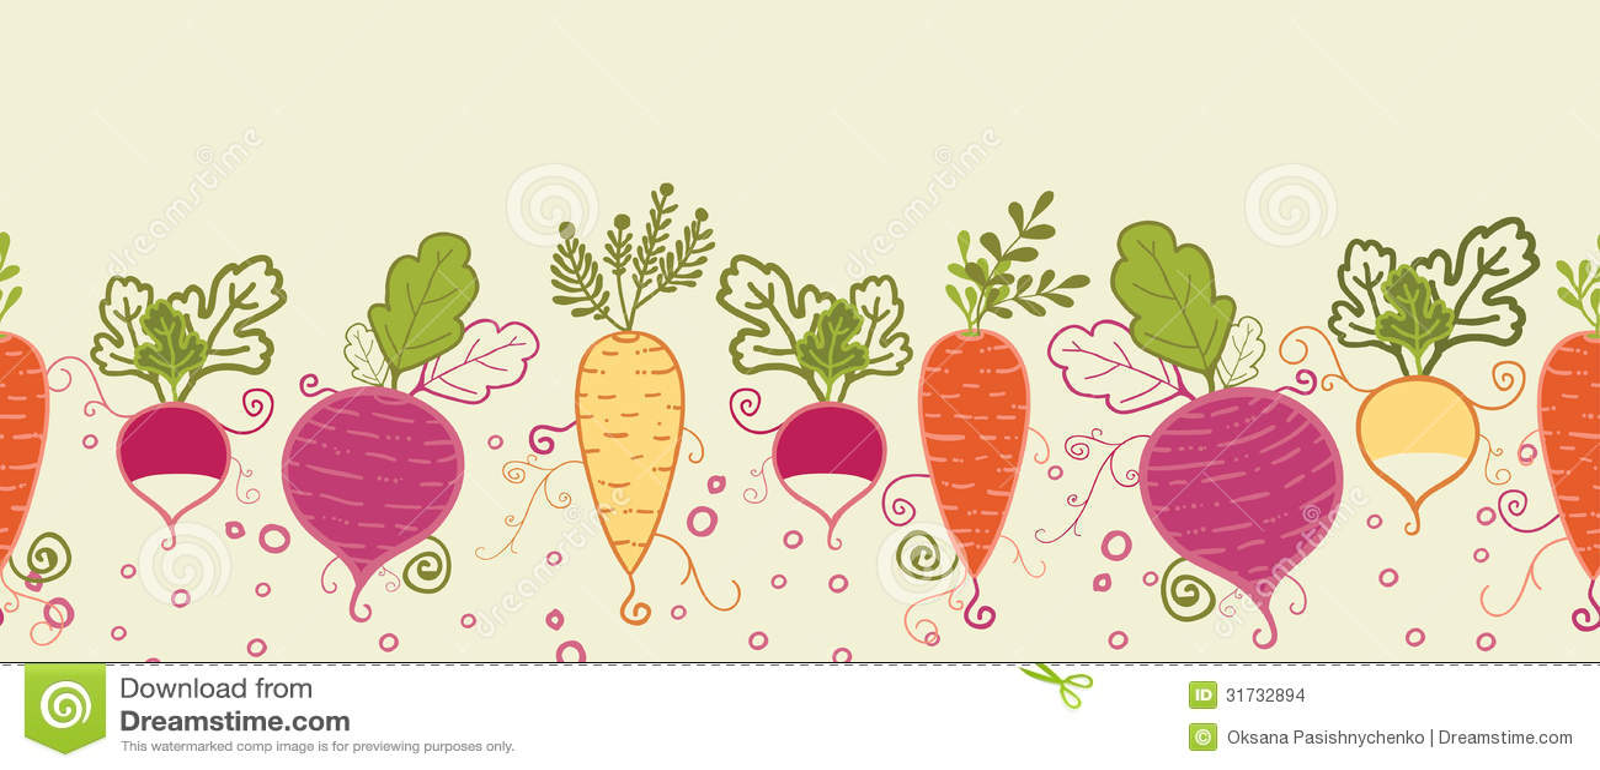 Vegetable garden border clipart vegetable garden border - Vegetable Garden Vector Root Vegetables Horizontal Seamless Pattern Stock Images Download